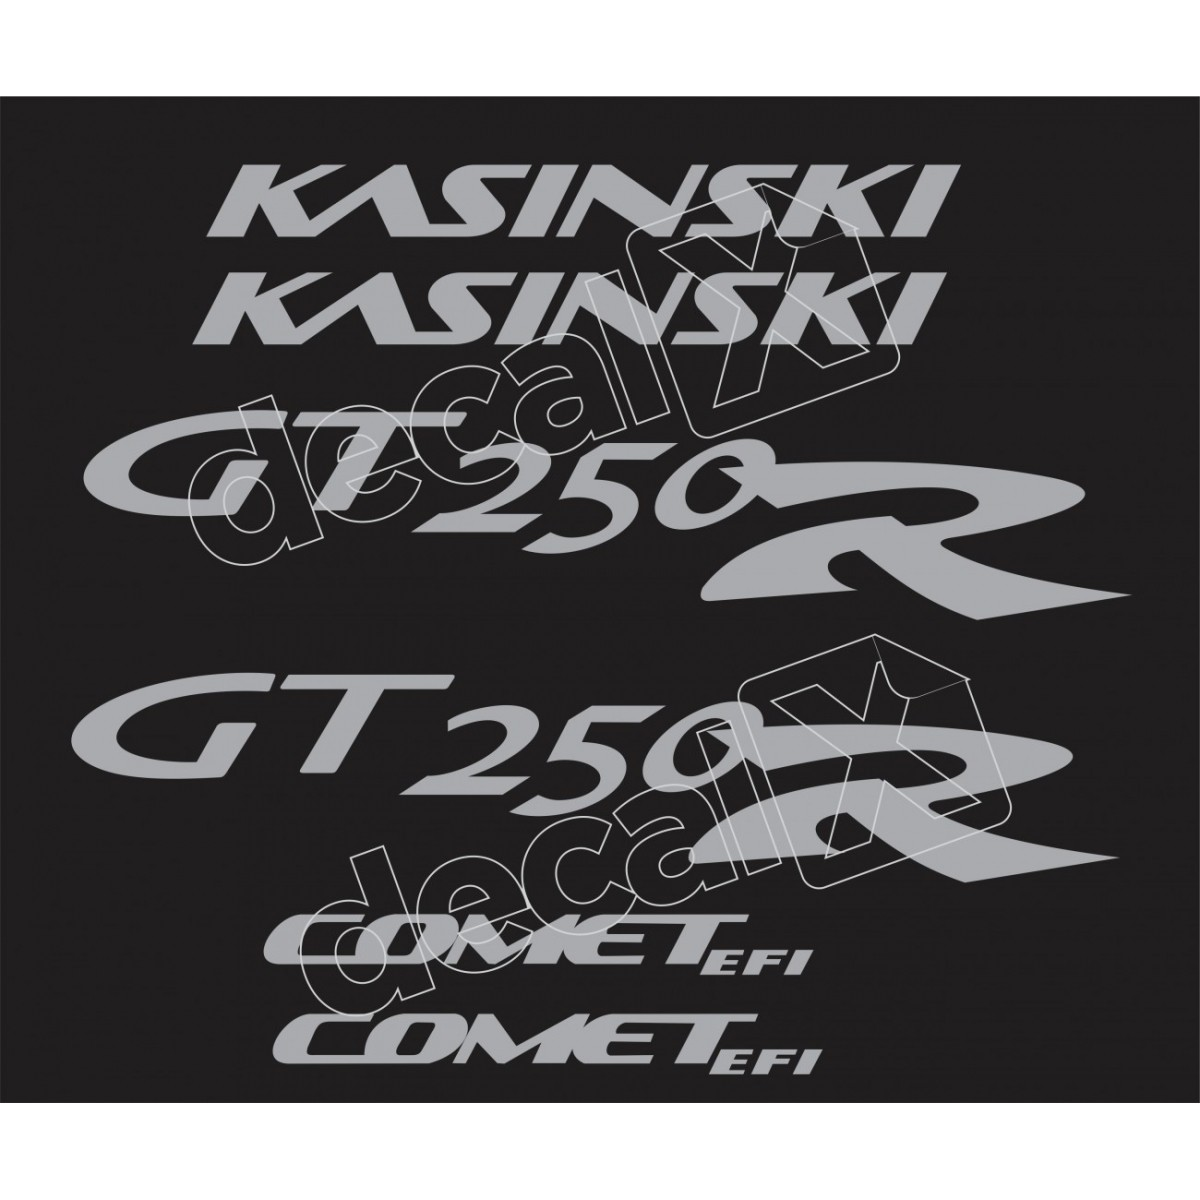 Kit Adesivos Kasinski Comet Gt 250r Em Prata 03